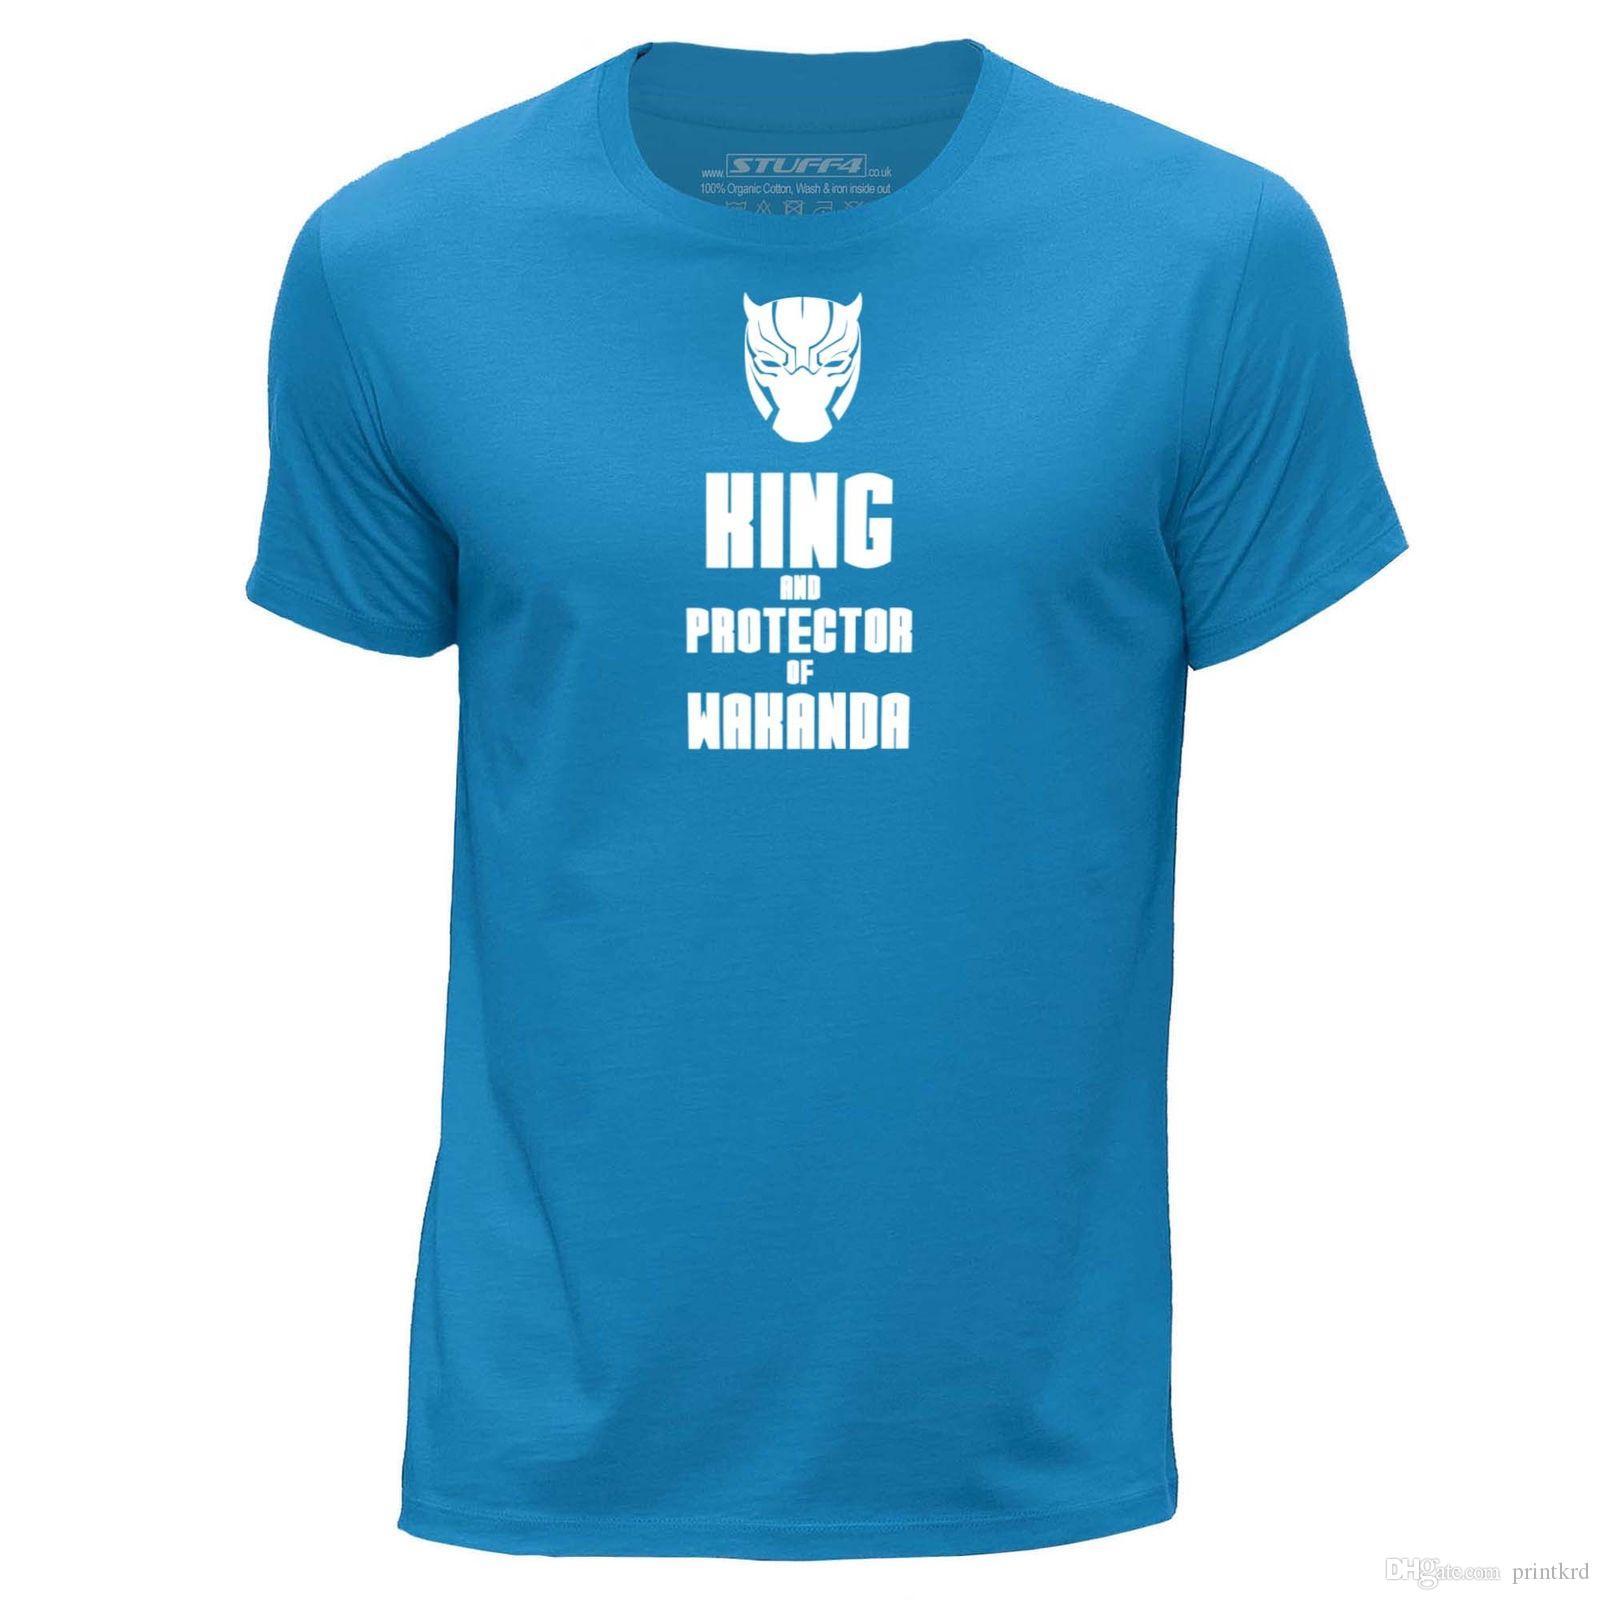 e0f013c5ab99 STUFF4 Top Tee/Blau/Rundhals T Shirt/Black Panther Inspiriert König/SZ  Coolest T Shirts Online Buy Shirt Designs From Printkrd, $10.38  DHgate.Com